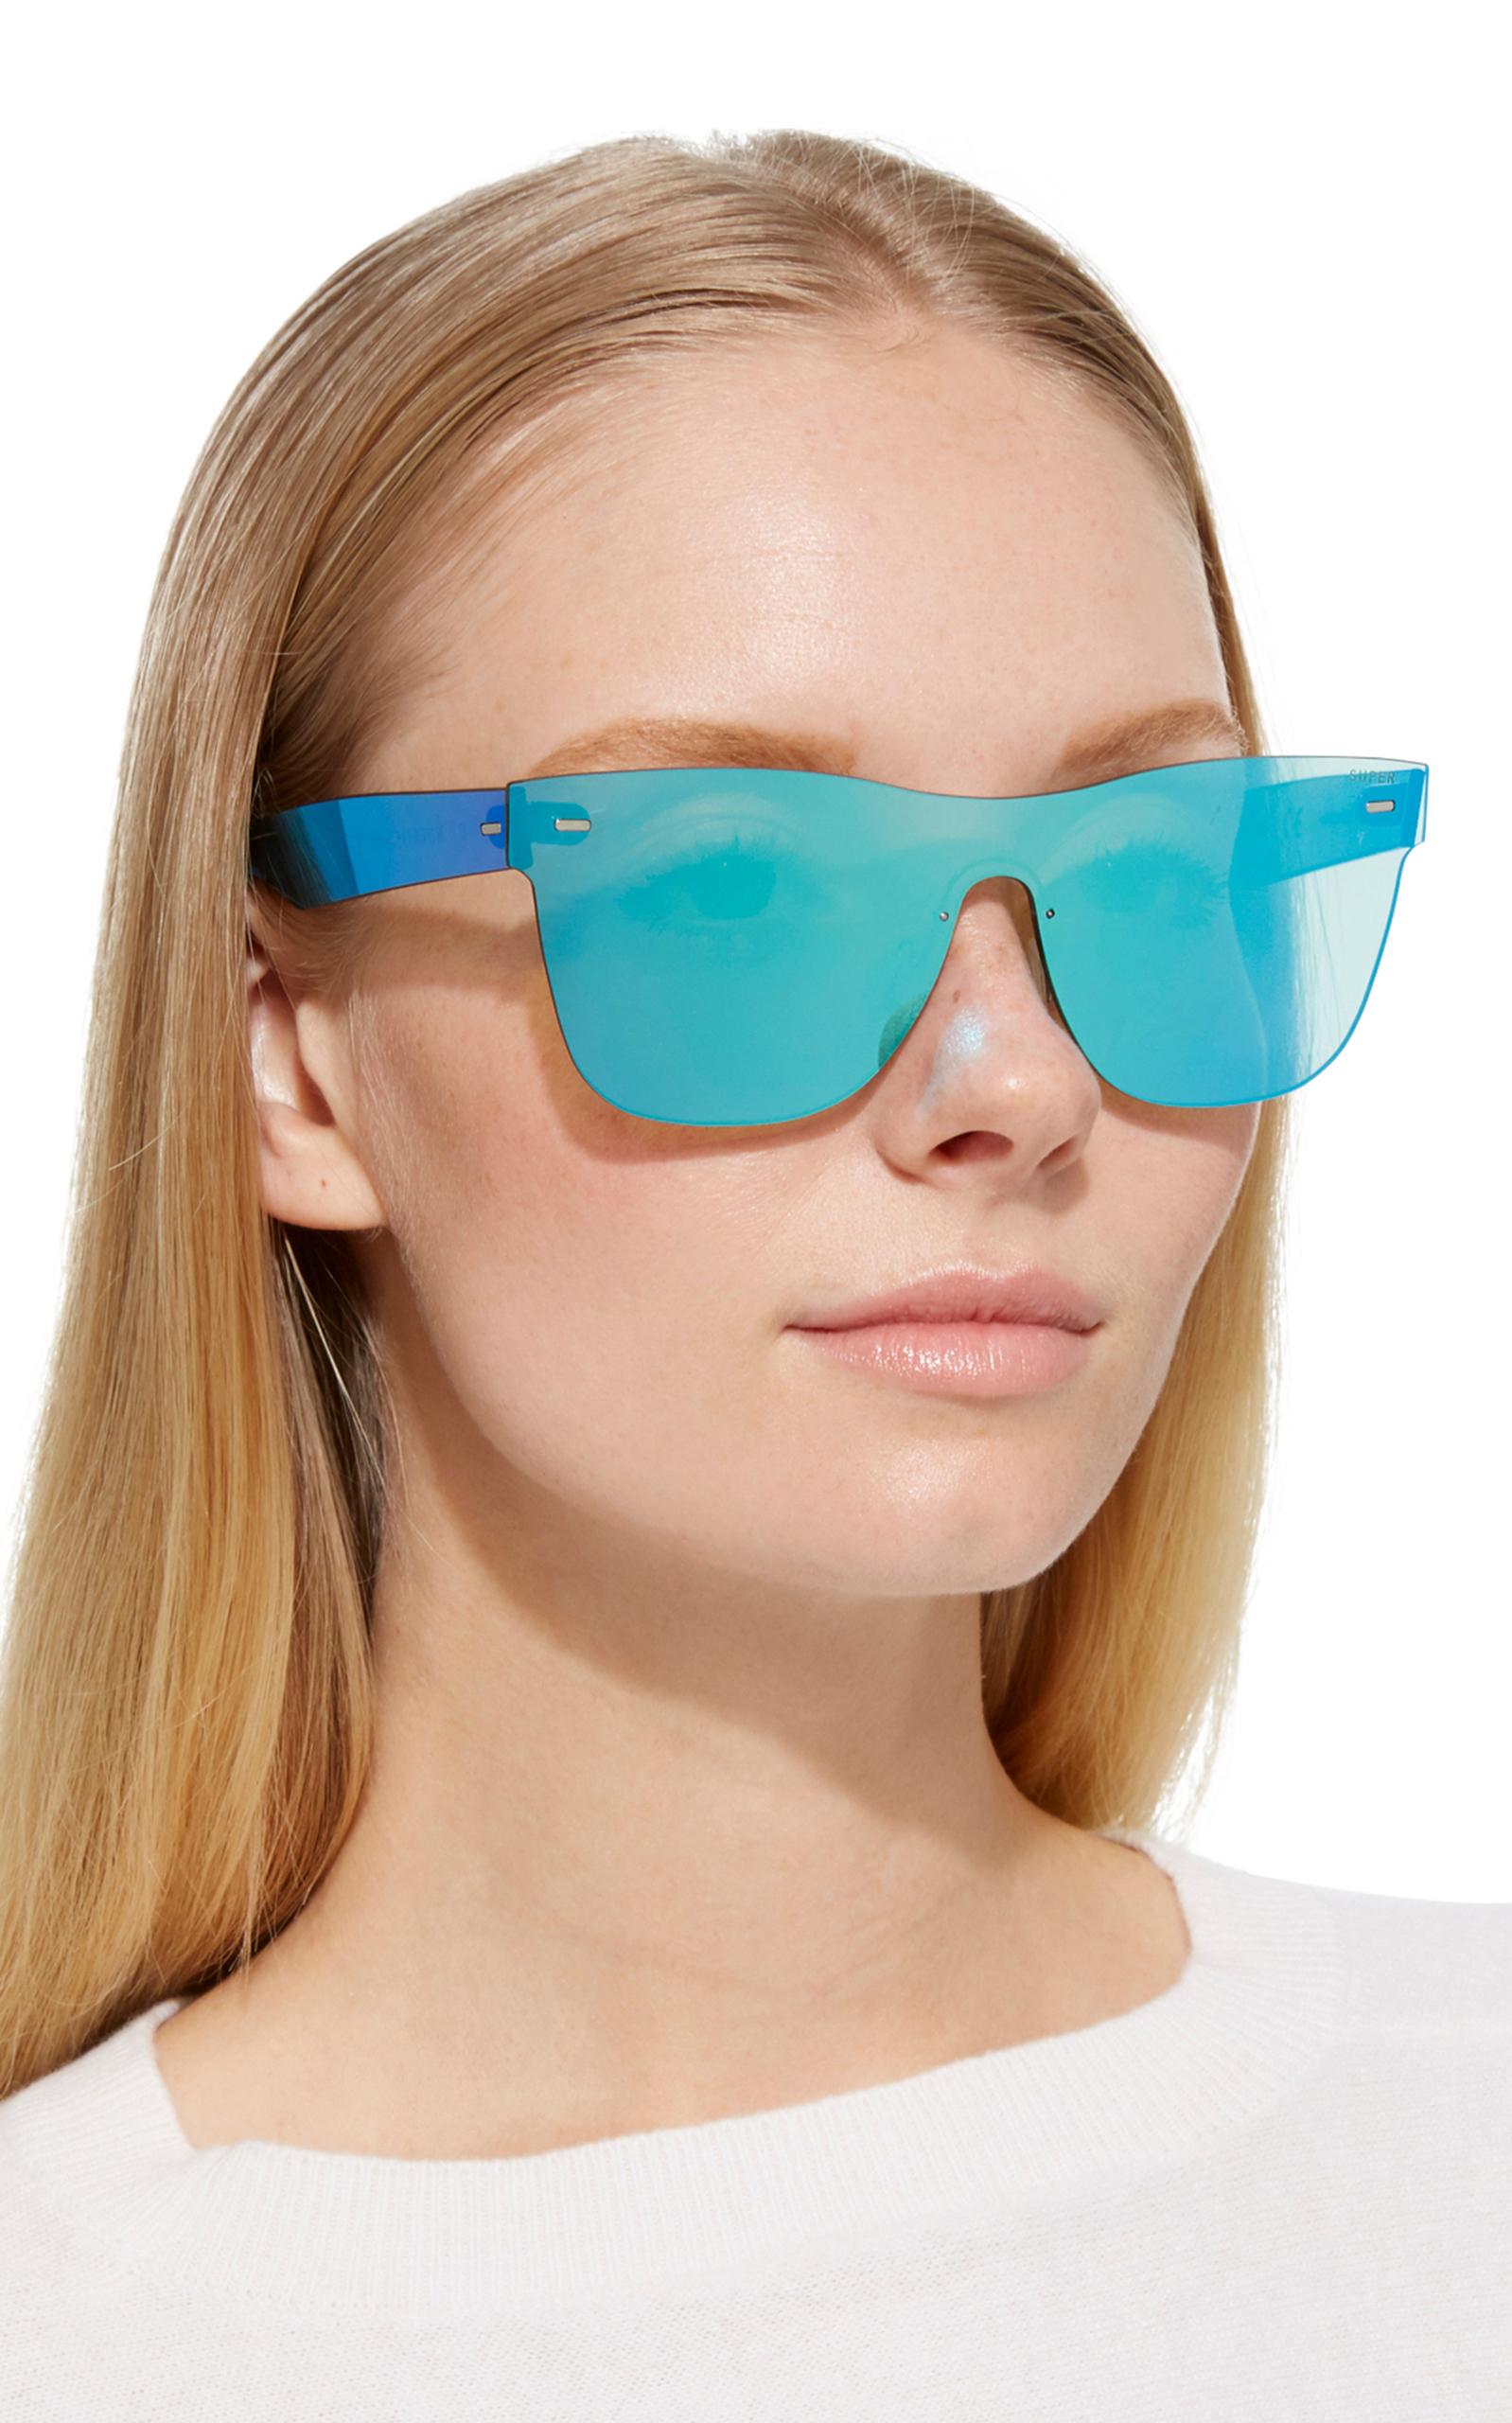 cd78fefba8a Tuttolente Classic Azure Acetate Sunglasses by SUPER by ...